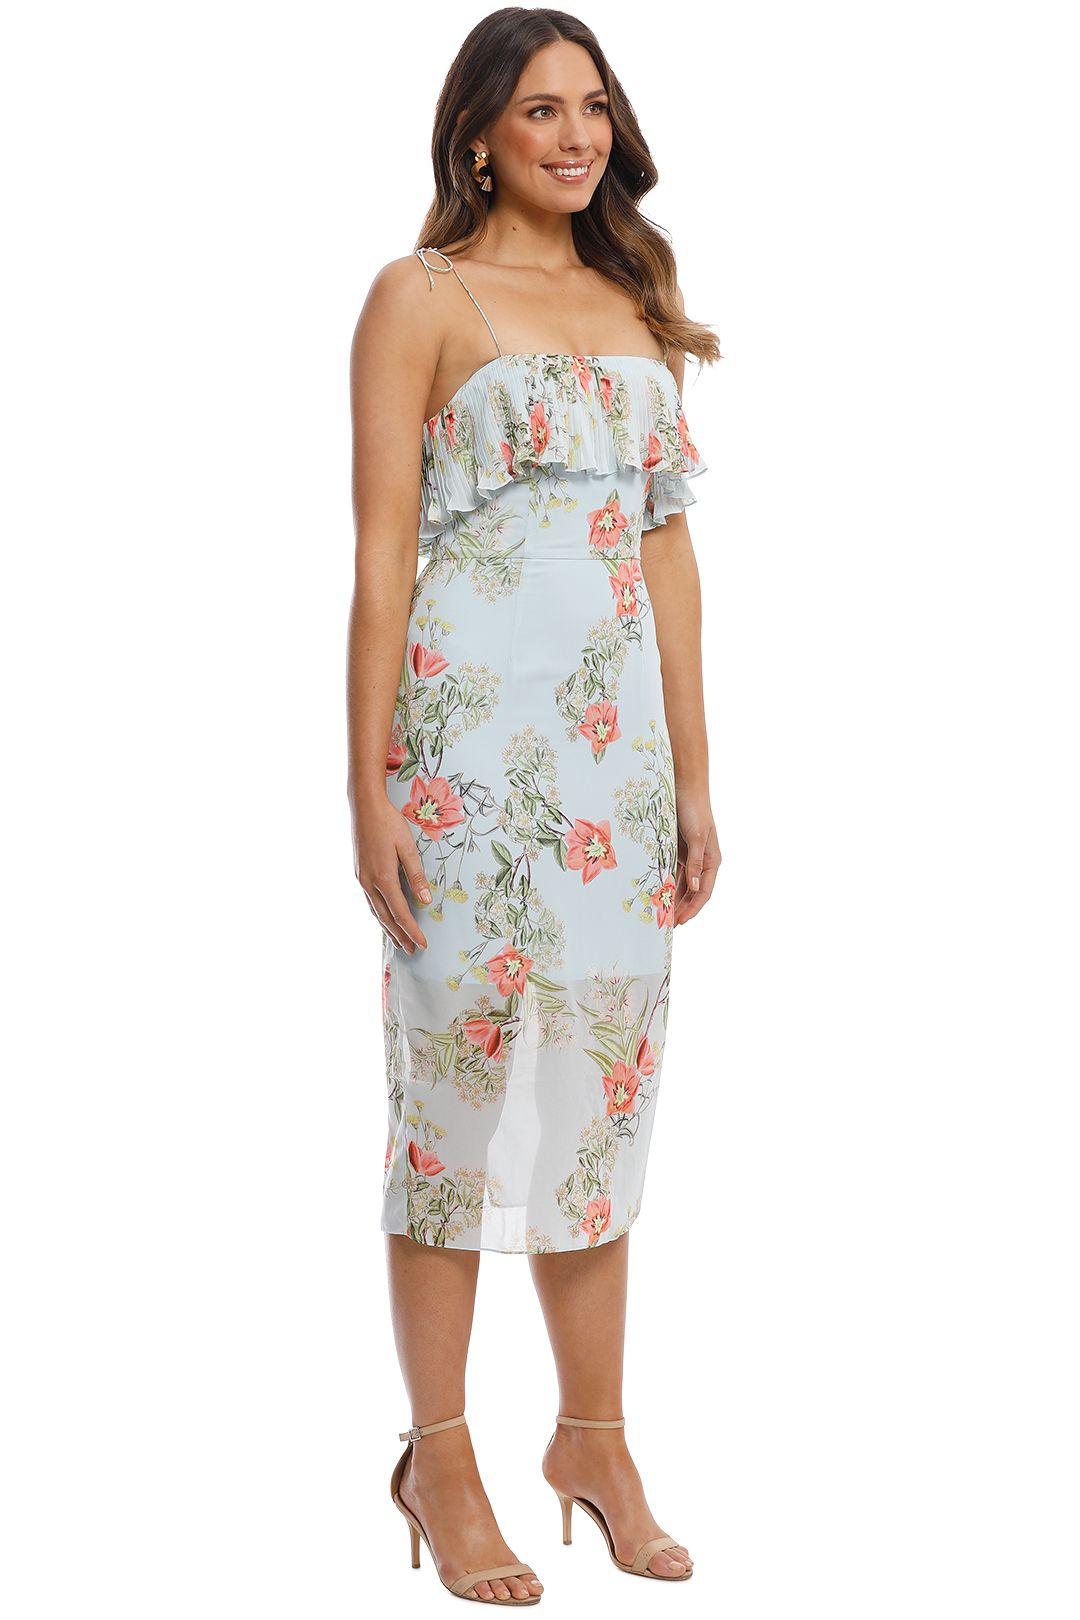 Cooper St - Blooming Knee Length Dress - Print Light - Side